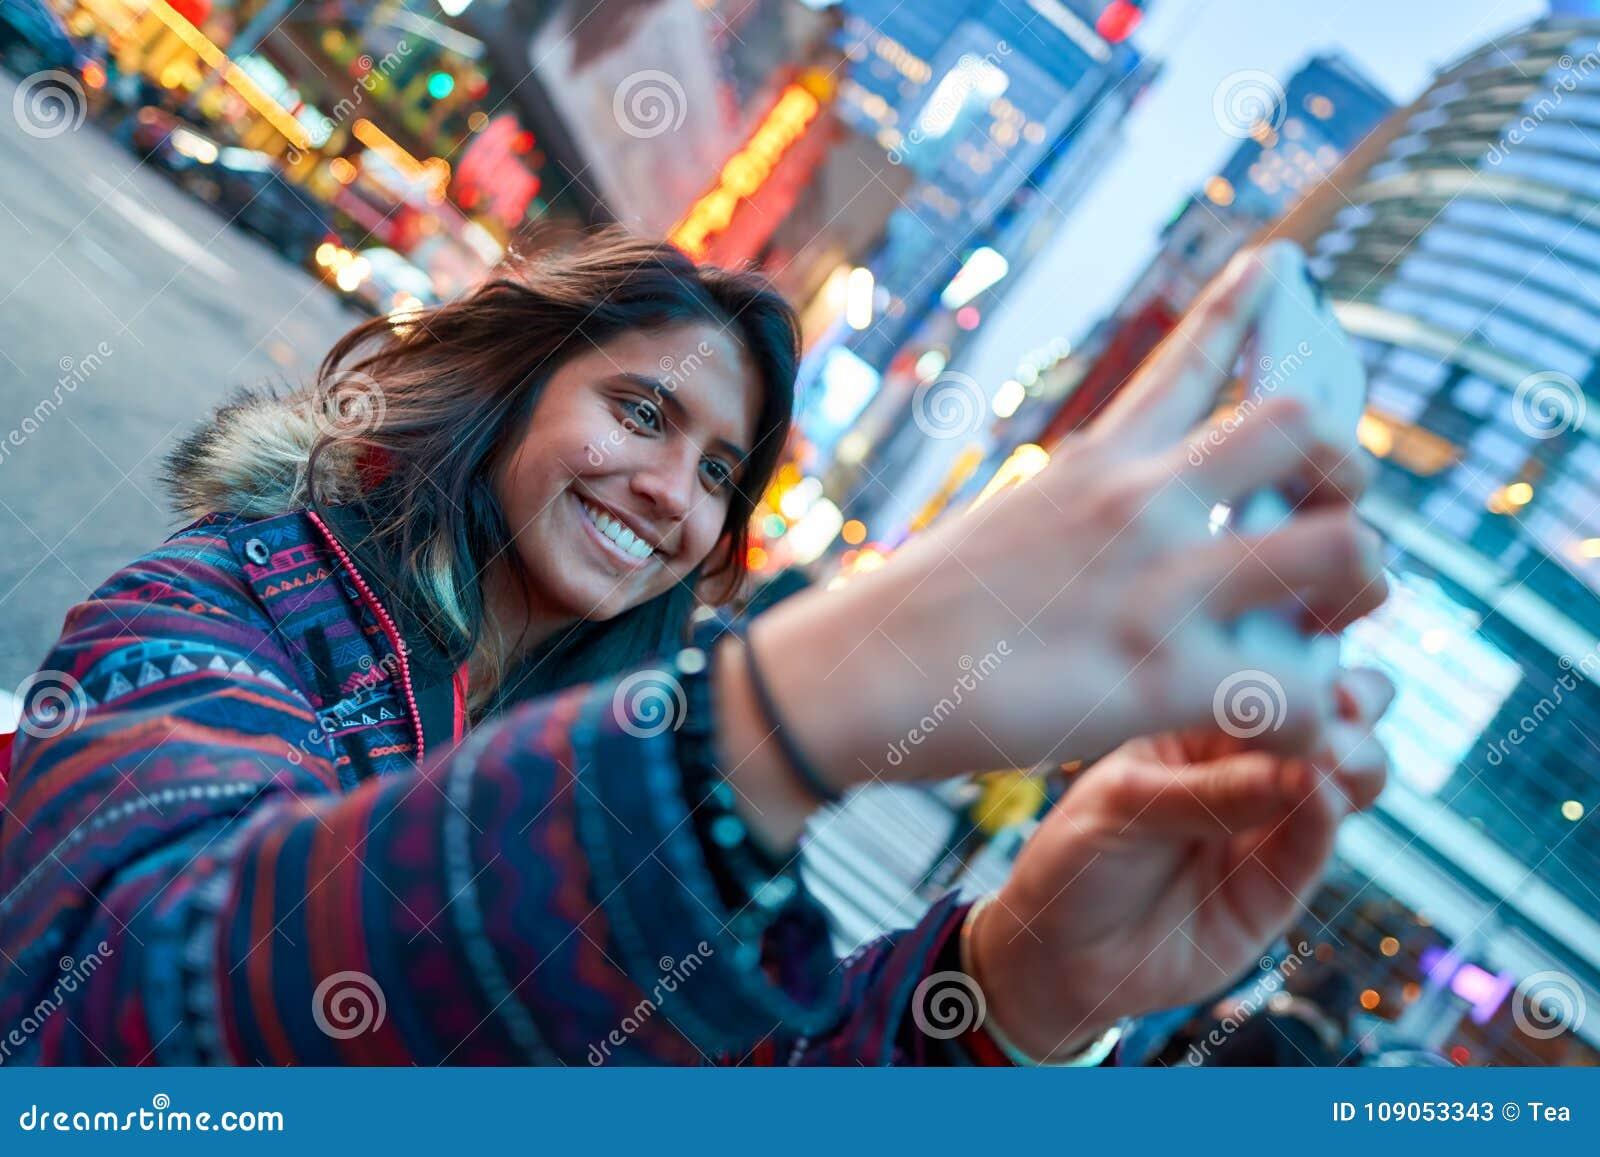 Selfie in New-York